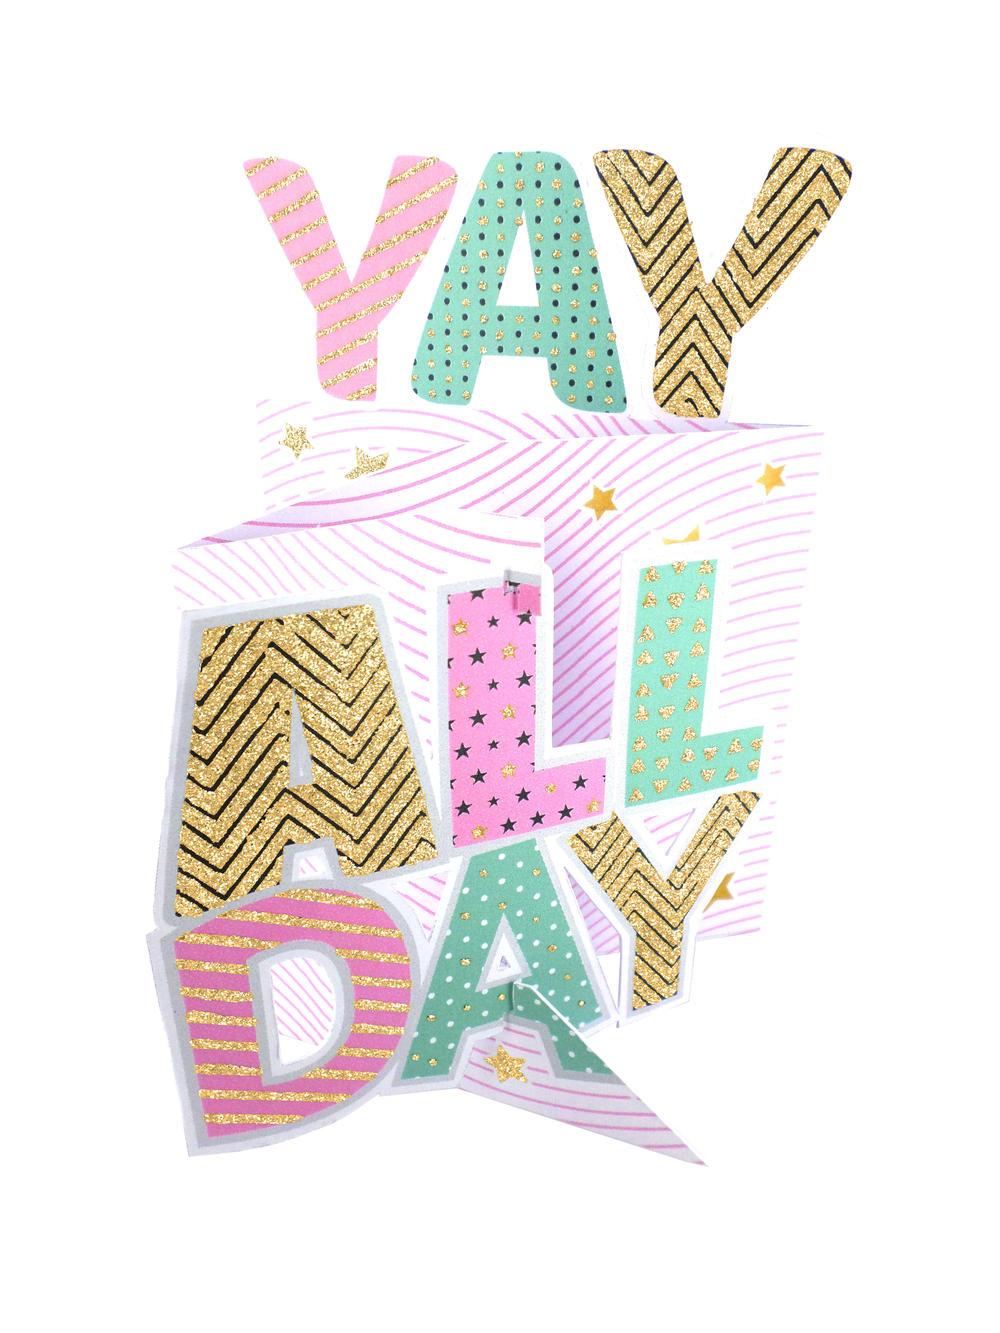 Yay All Day 3D Cutting Edge Birthday Card